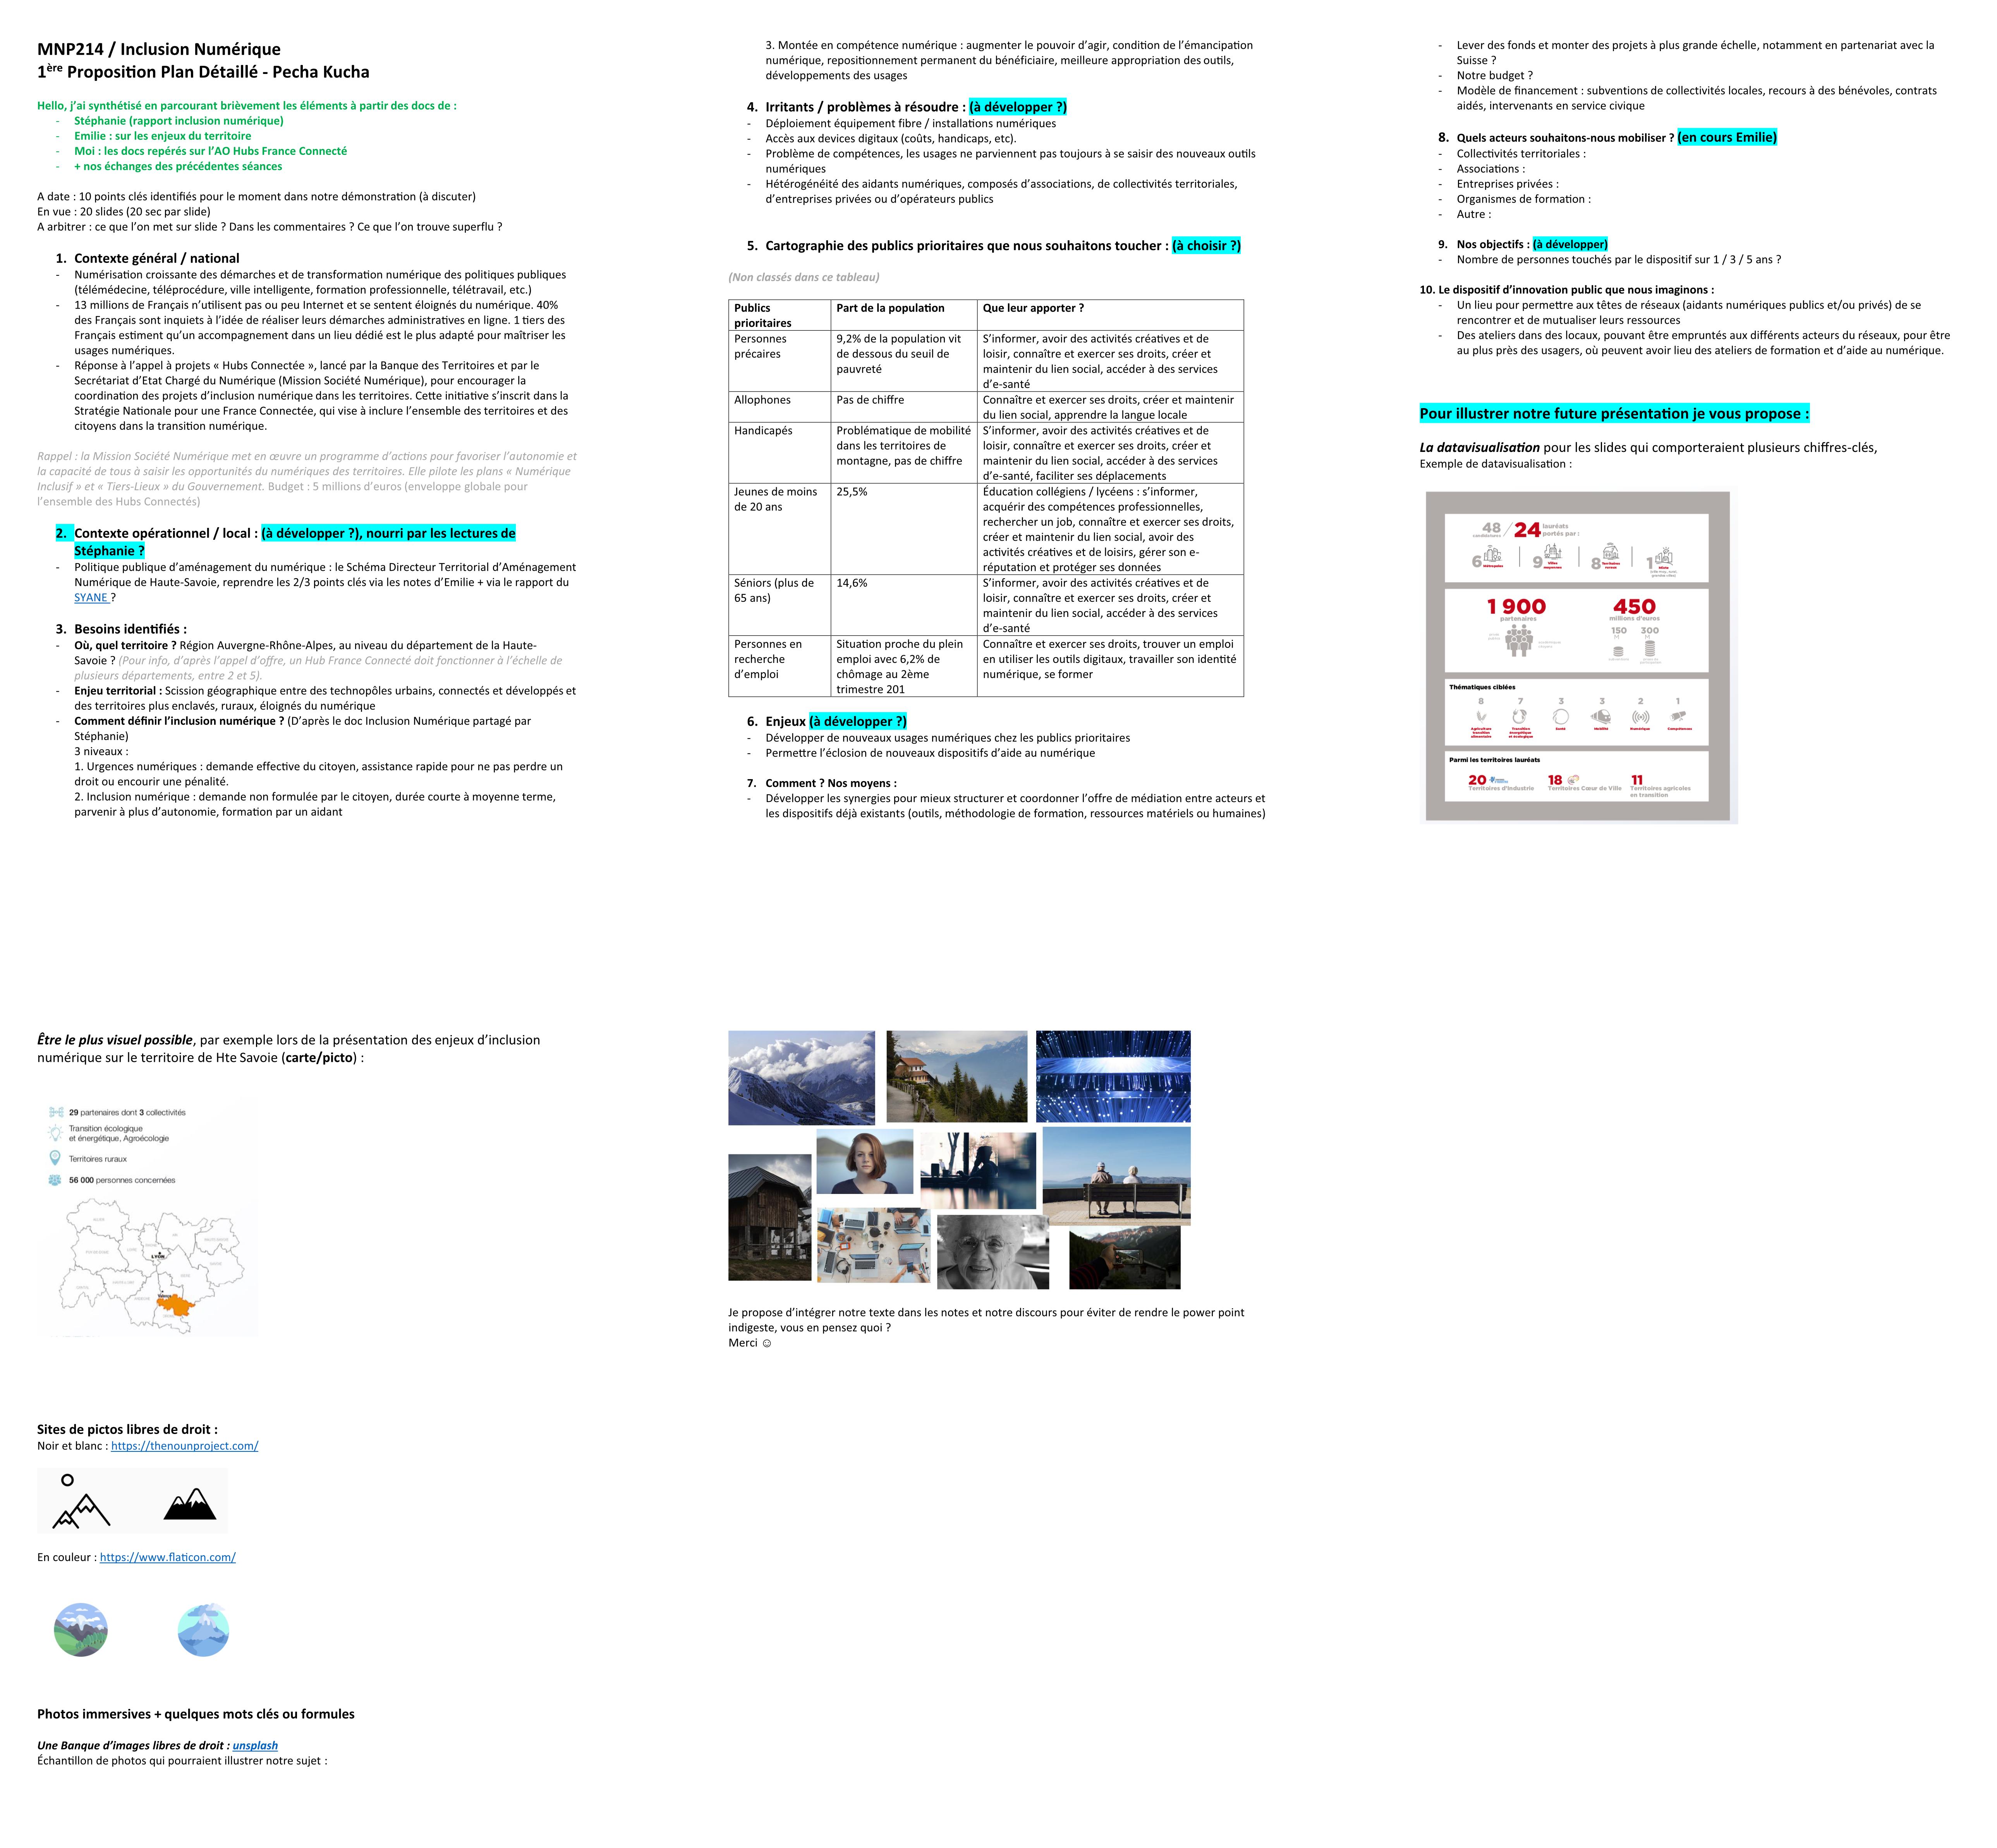 image MNP214_InclusionNumerique_Plan_PK.jpg (4.6MB)